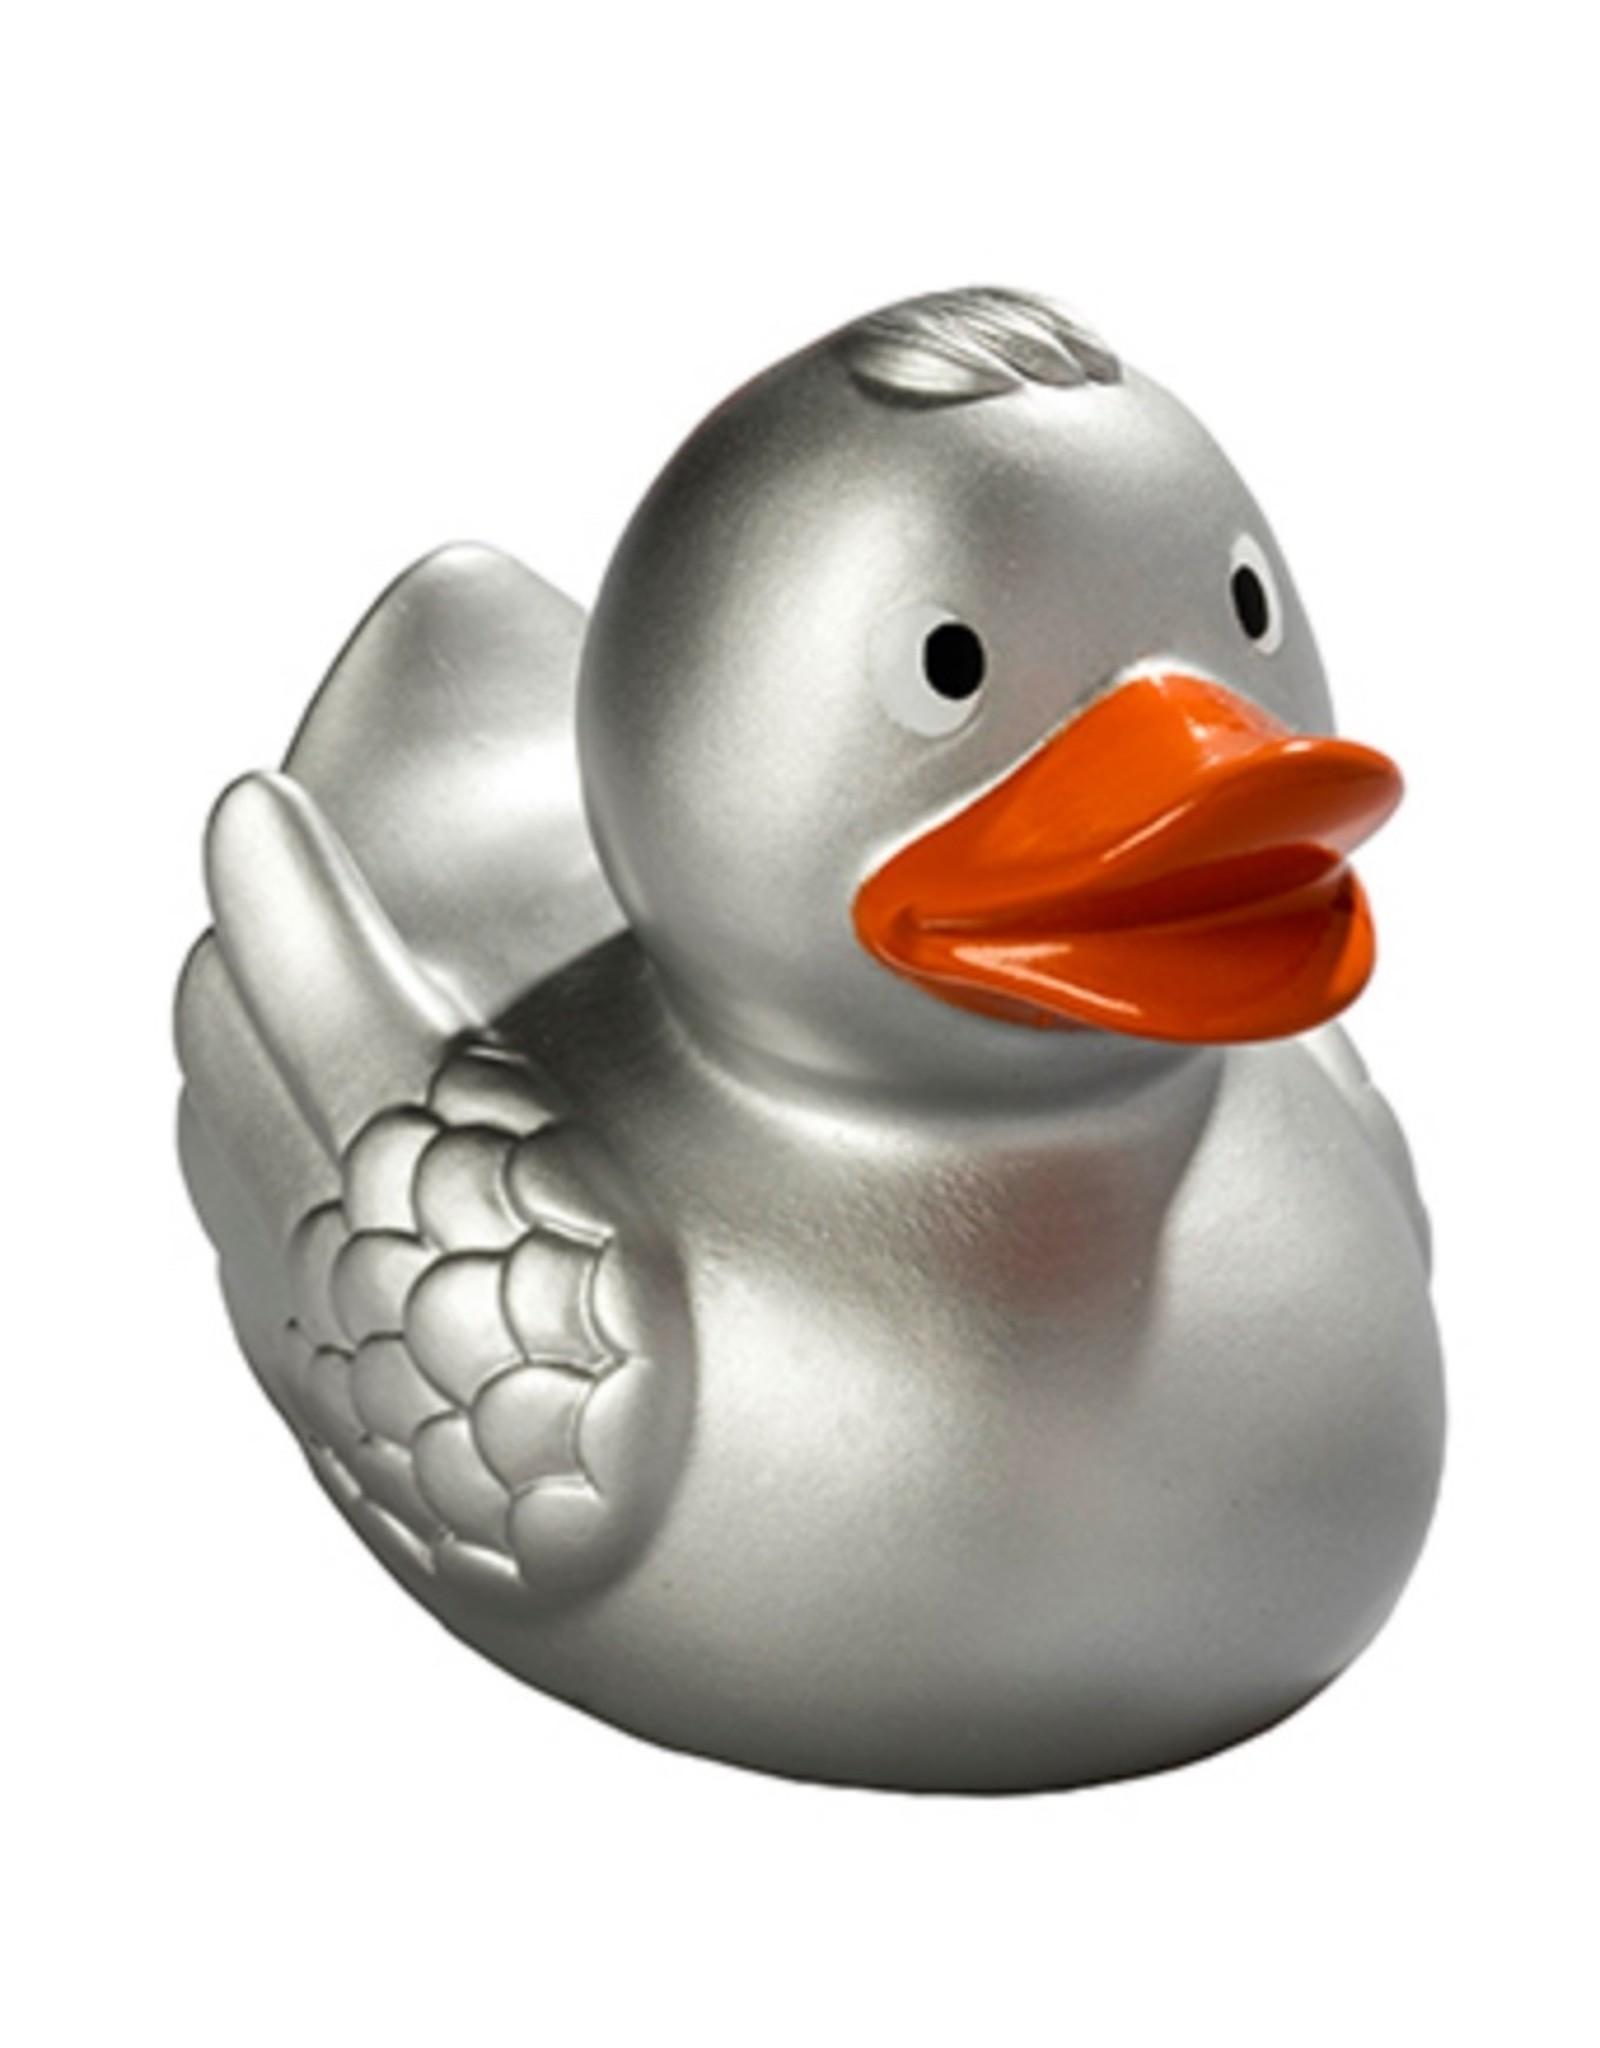 Silver Rubber Duck